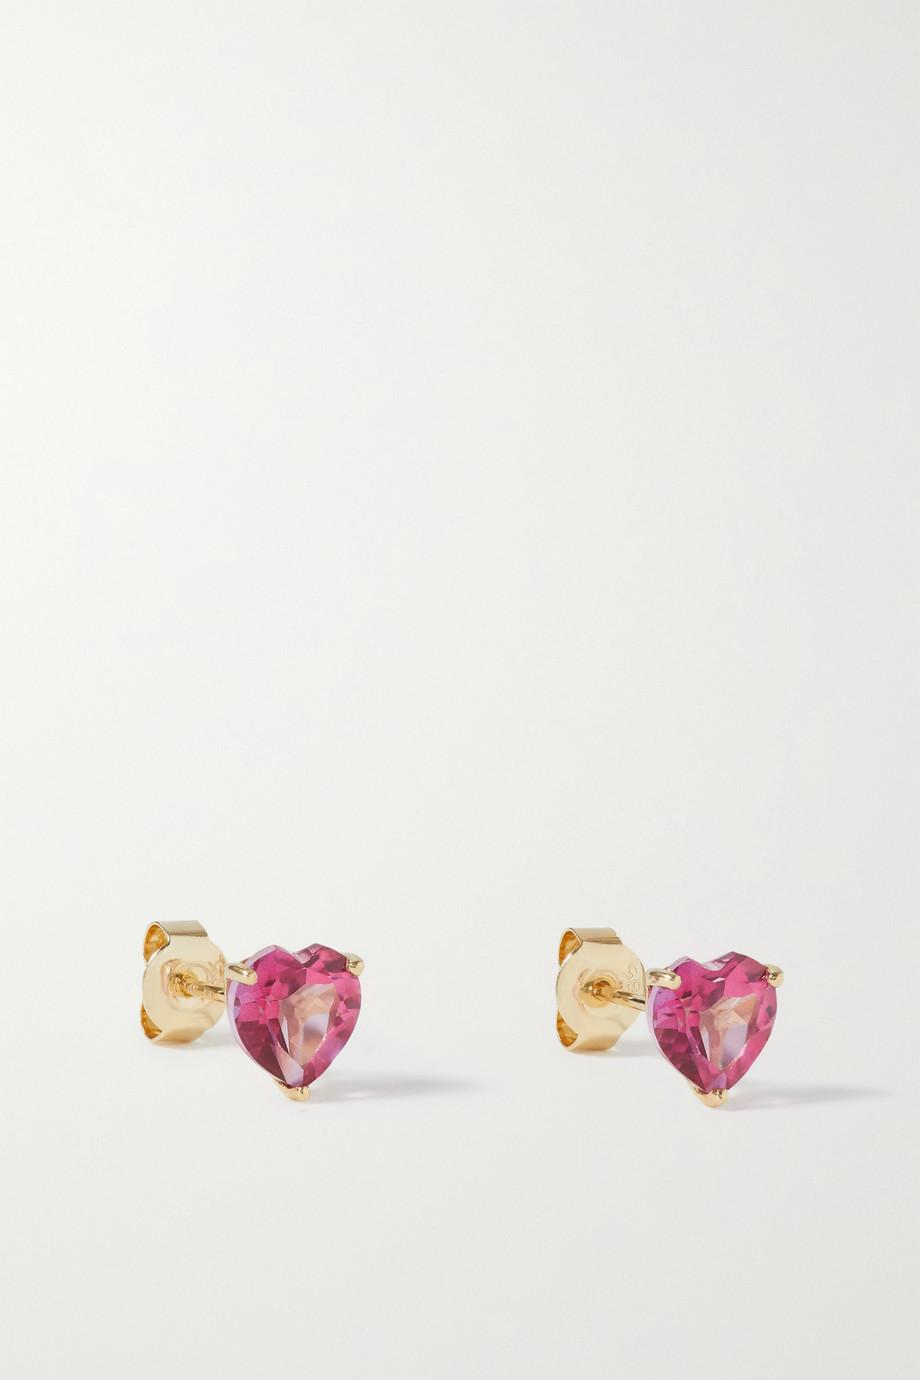 Fry Powers Rainbow Heart Ohrstecker aus 14 Karat Gold mit Topasen